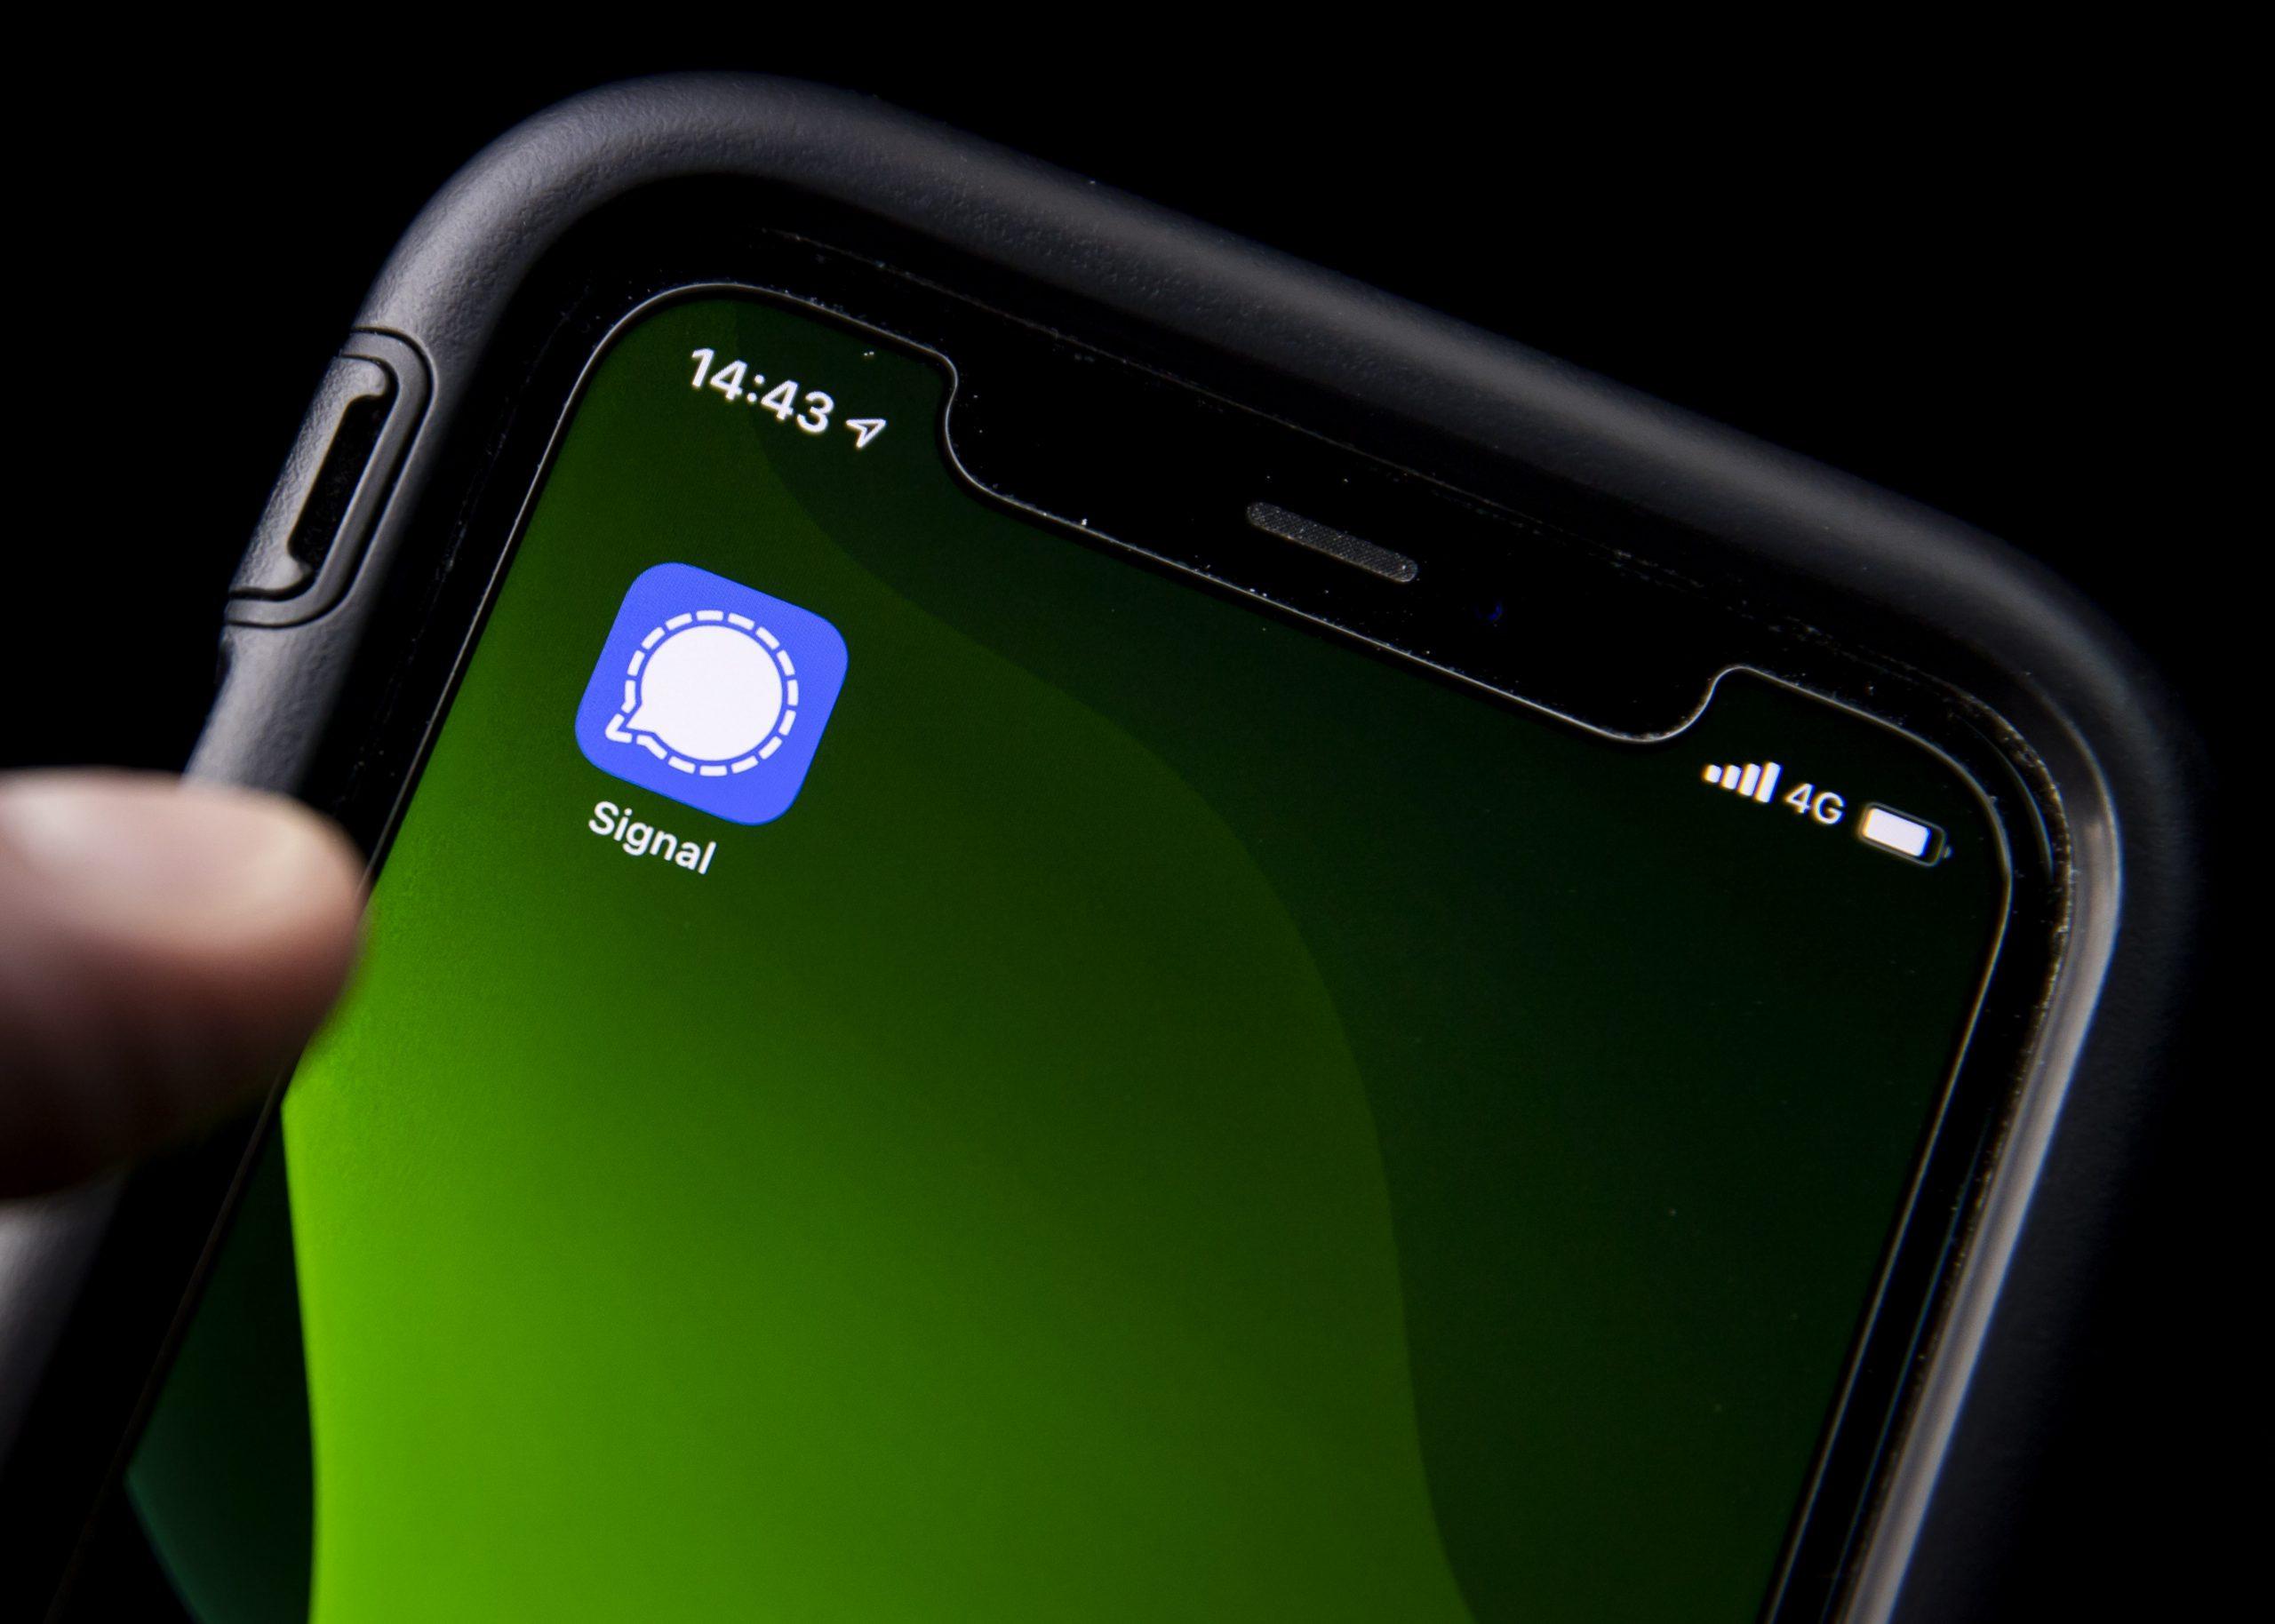 Signal WhatsApp alternatief